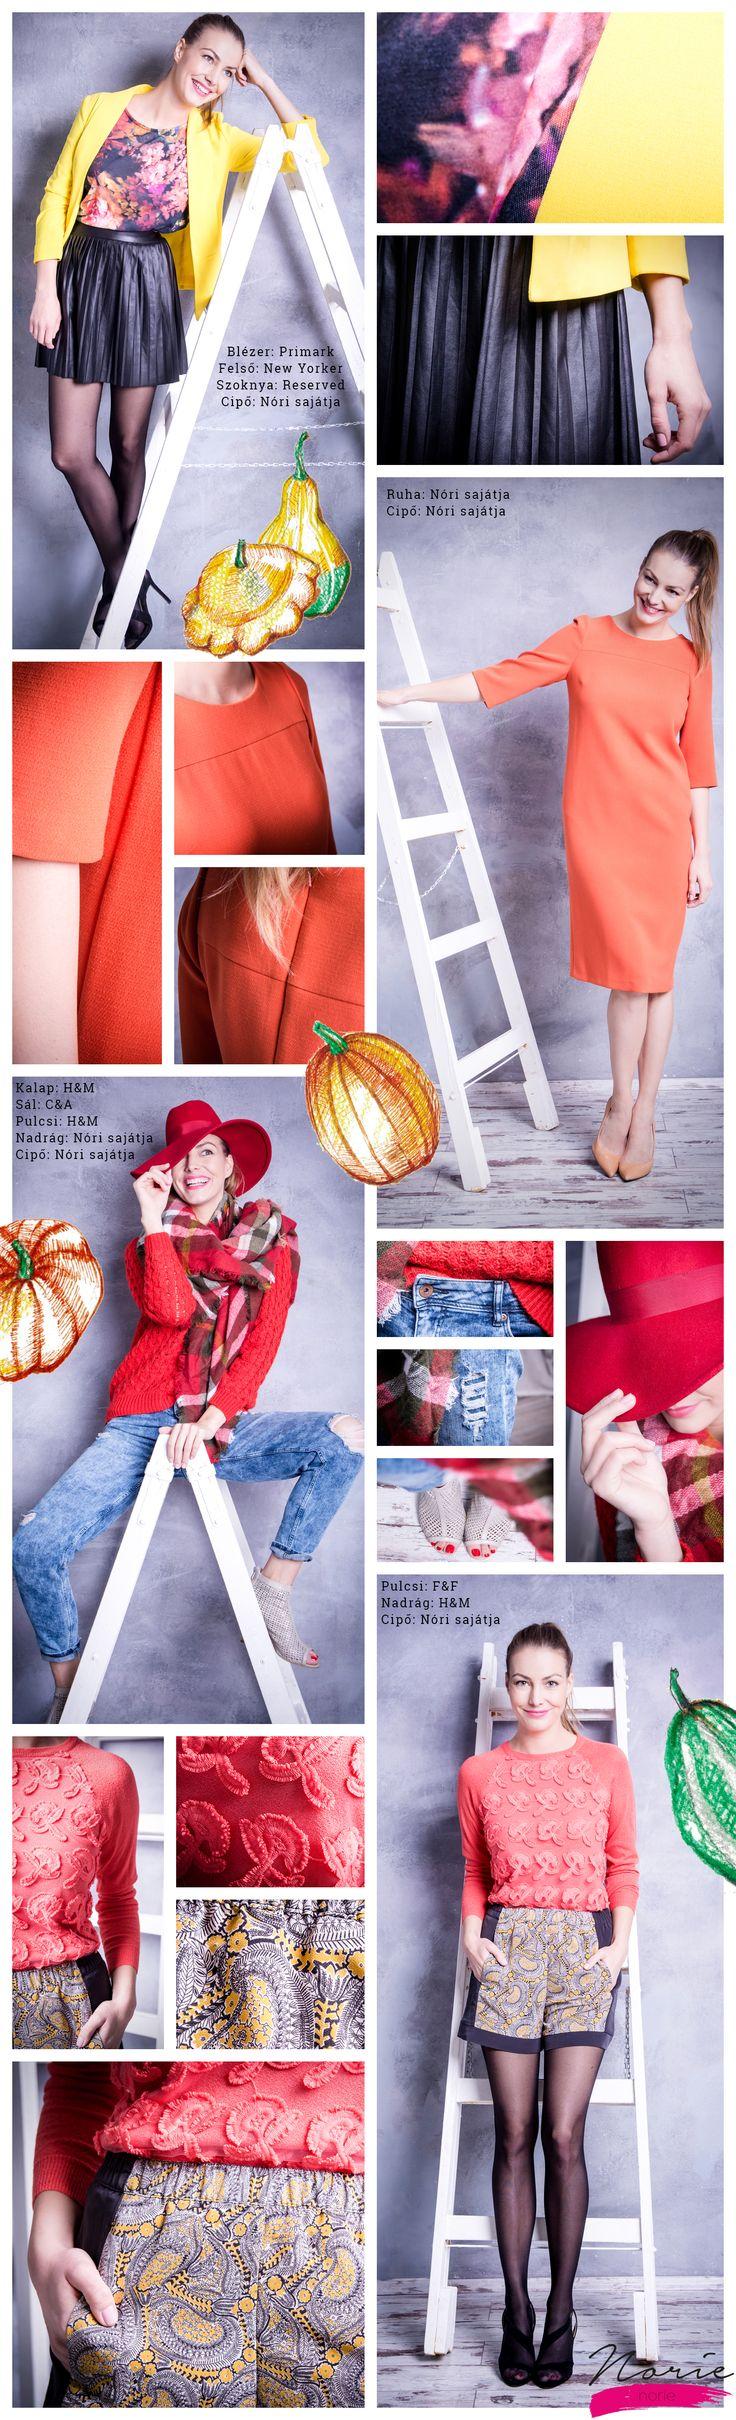 NORIE-blog  - fall fashion - Takács Nóra